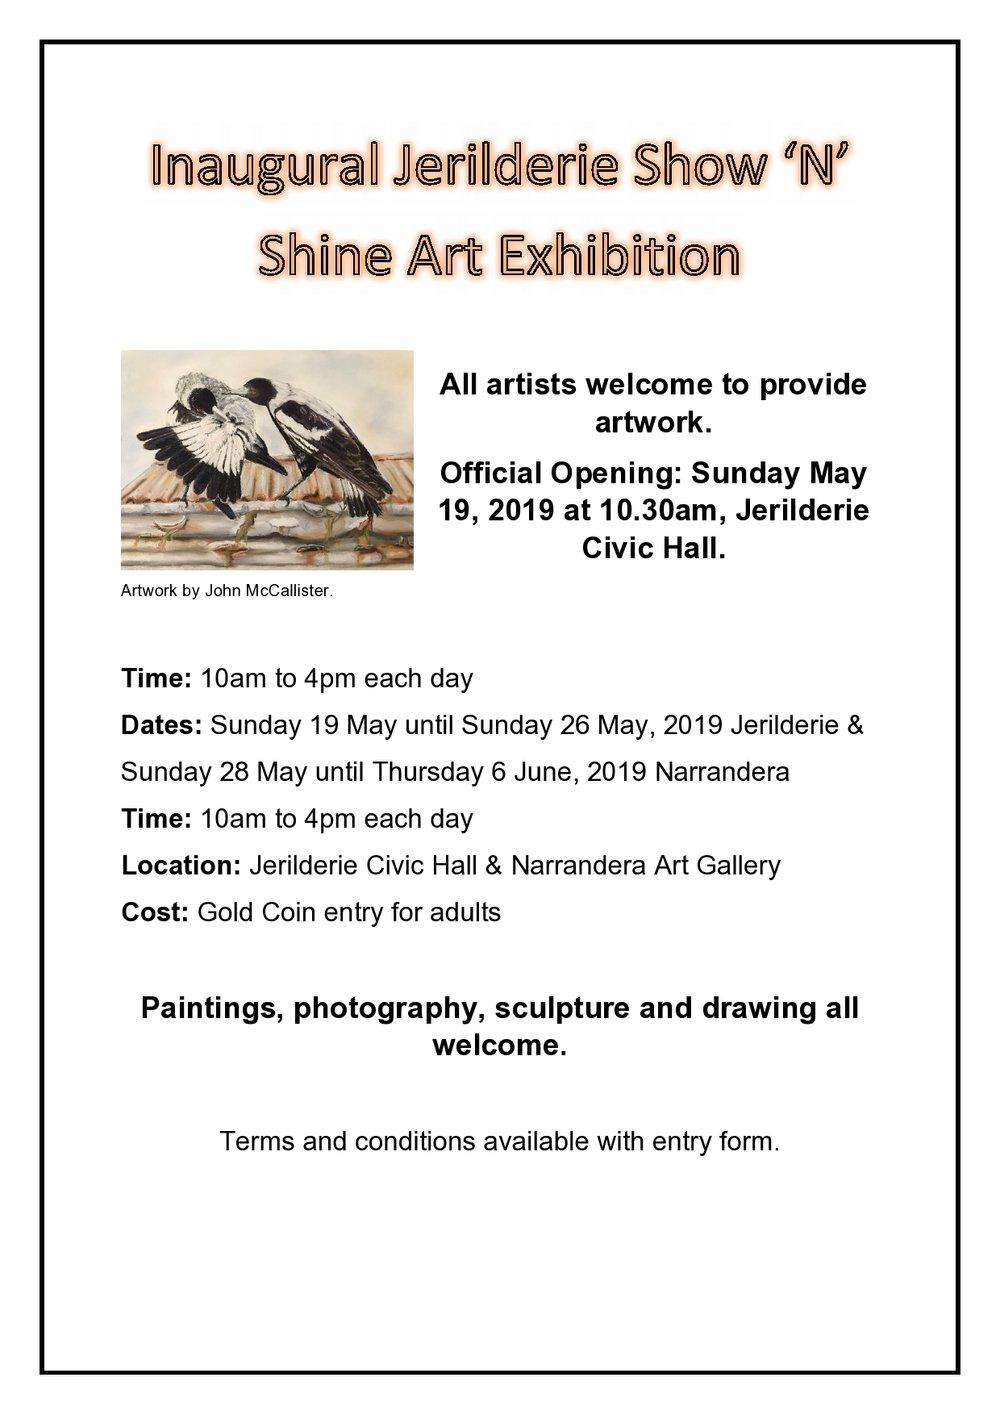 Show N Shine Art Exhibition Flyer-page0001.jpg